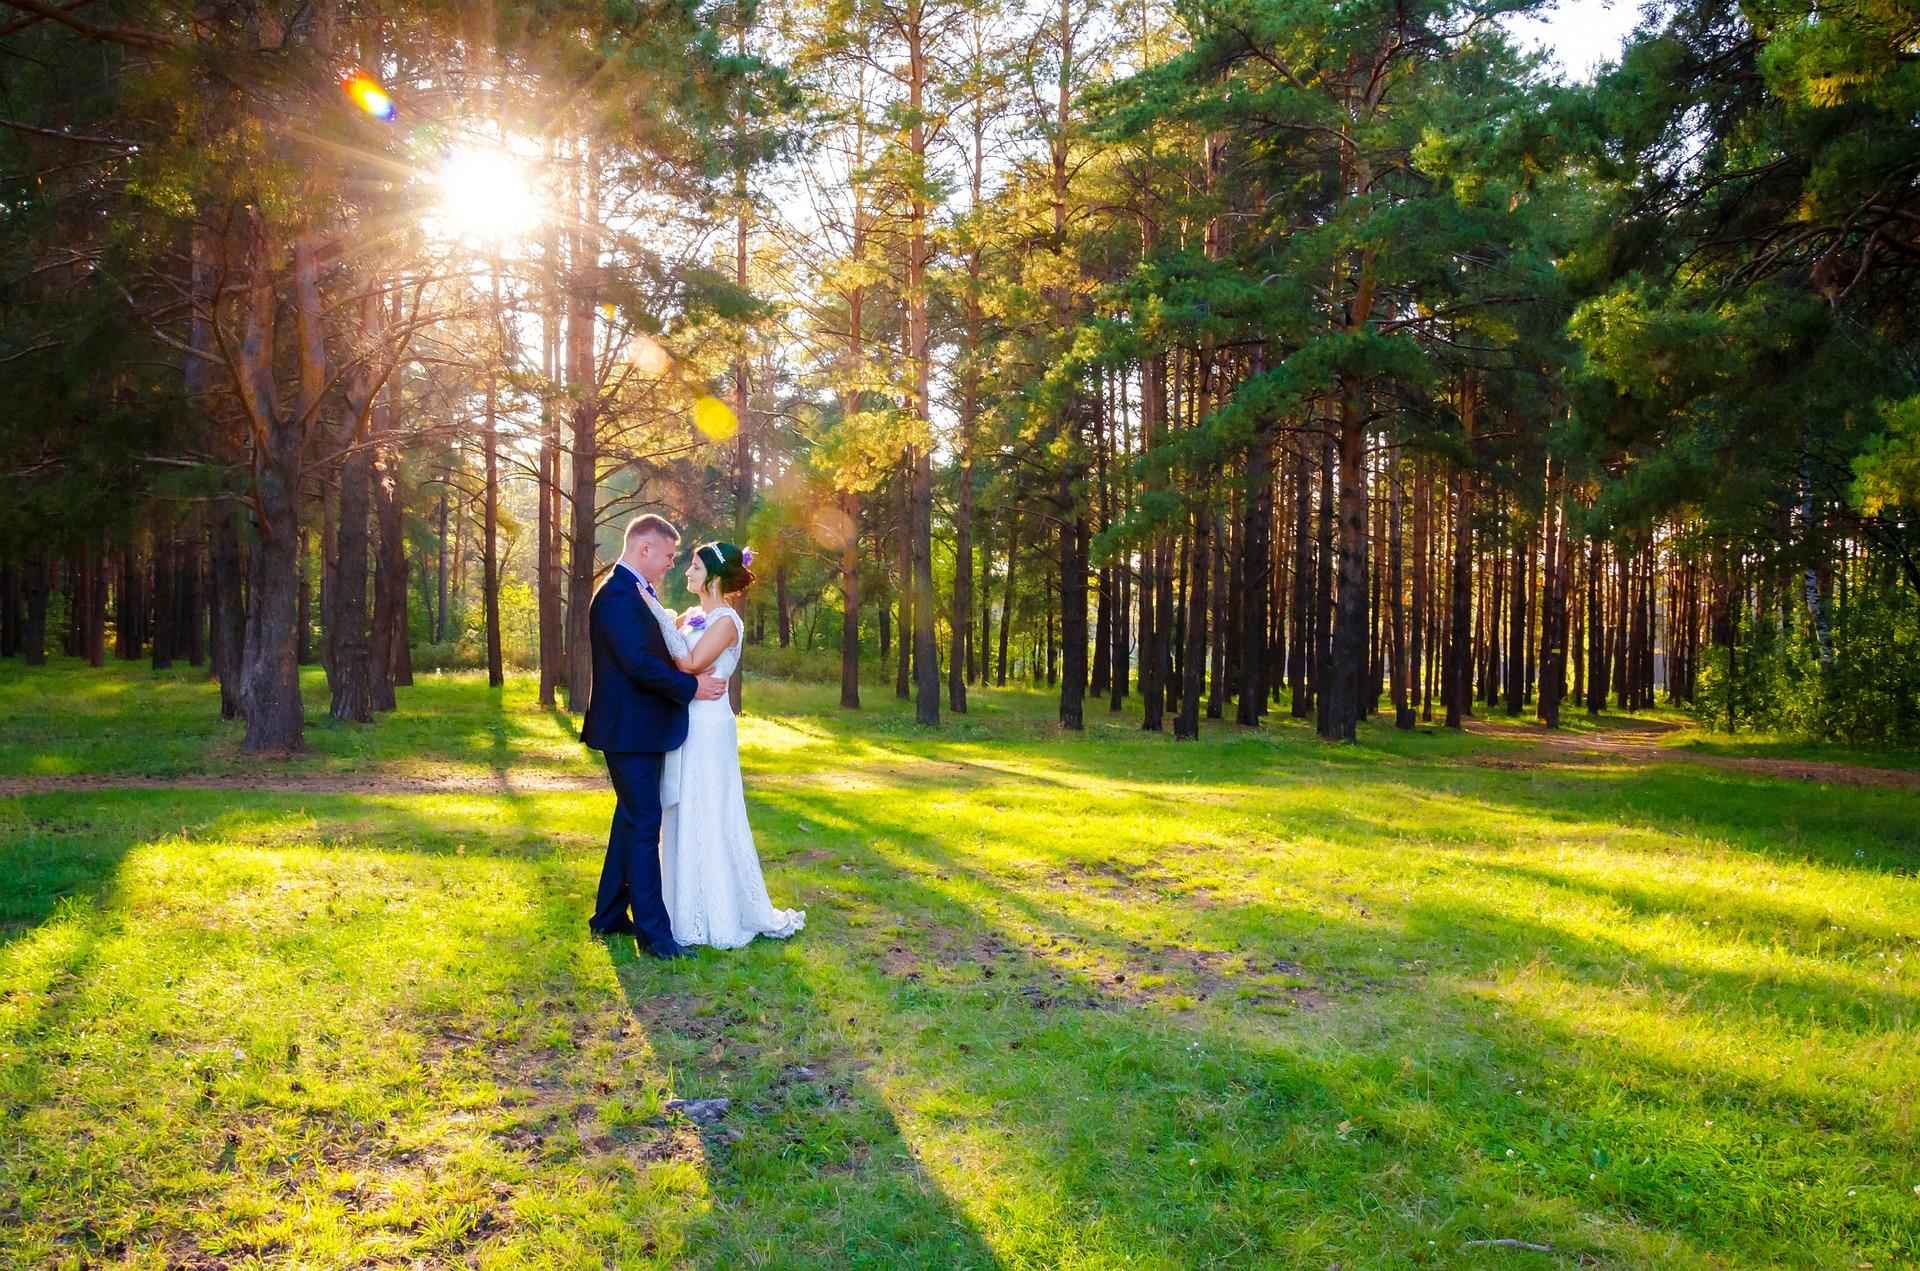 wedding-628515_1920